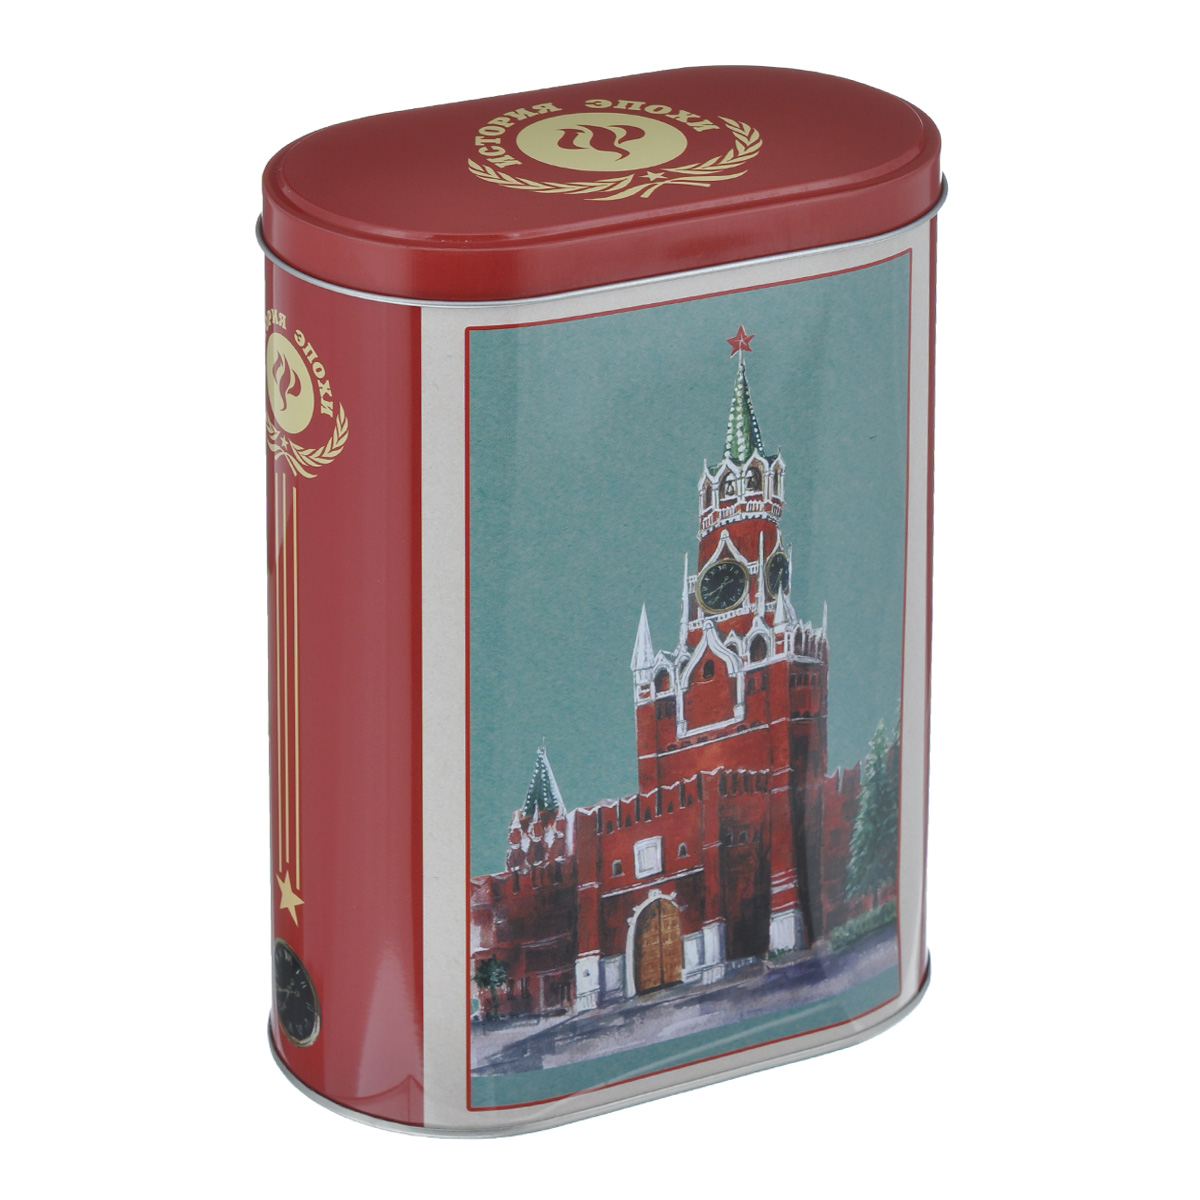 Банка для сыпучих продуктов Феникс-презент Кремль, 1,5 л броши sokolov 94040059 s